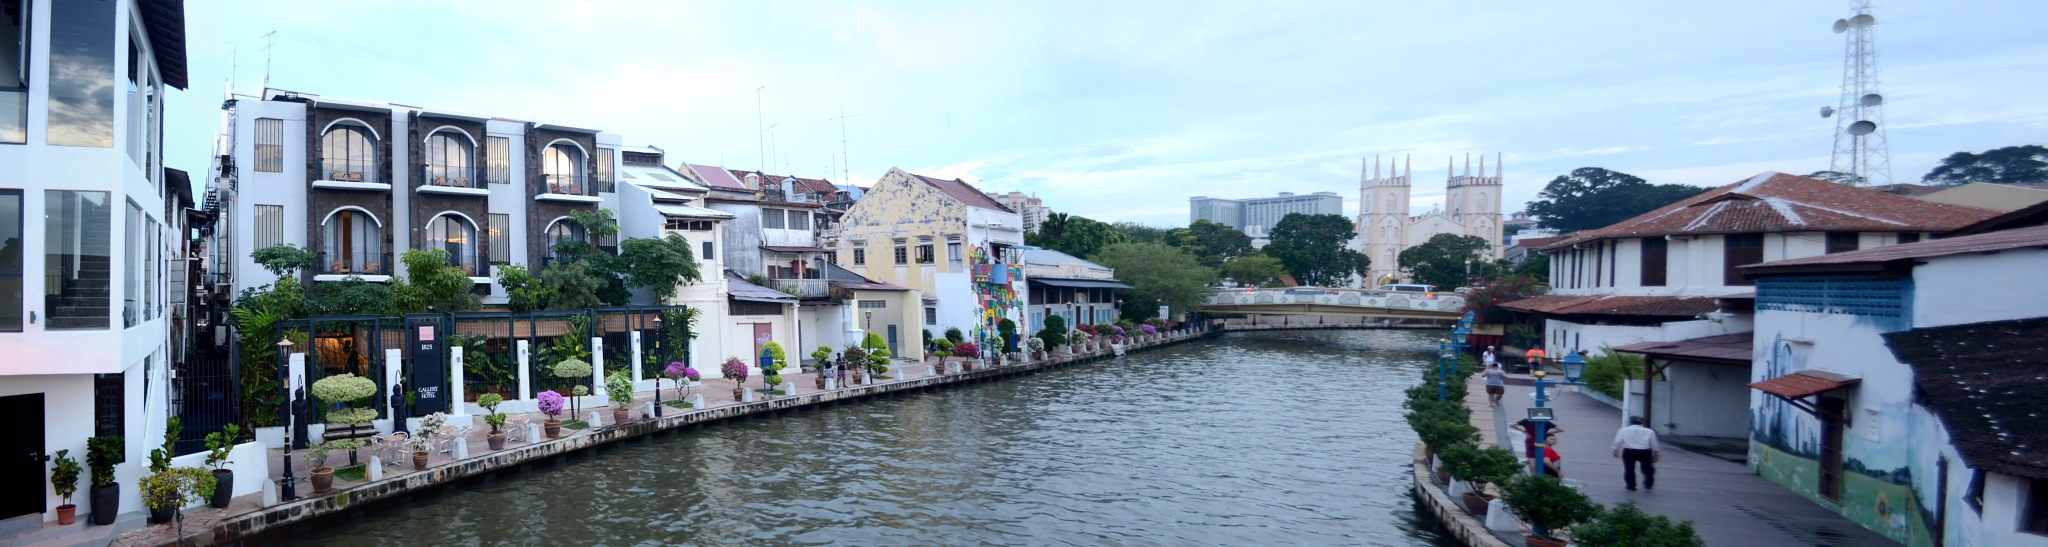 malacca river by wooyuenfoo